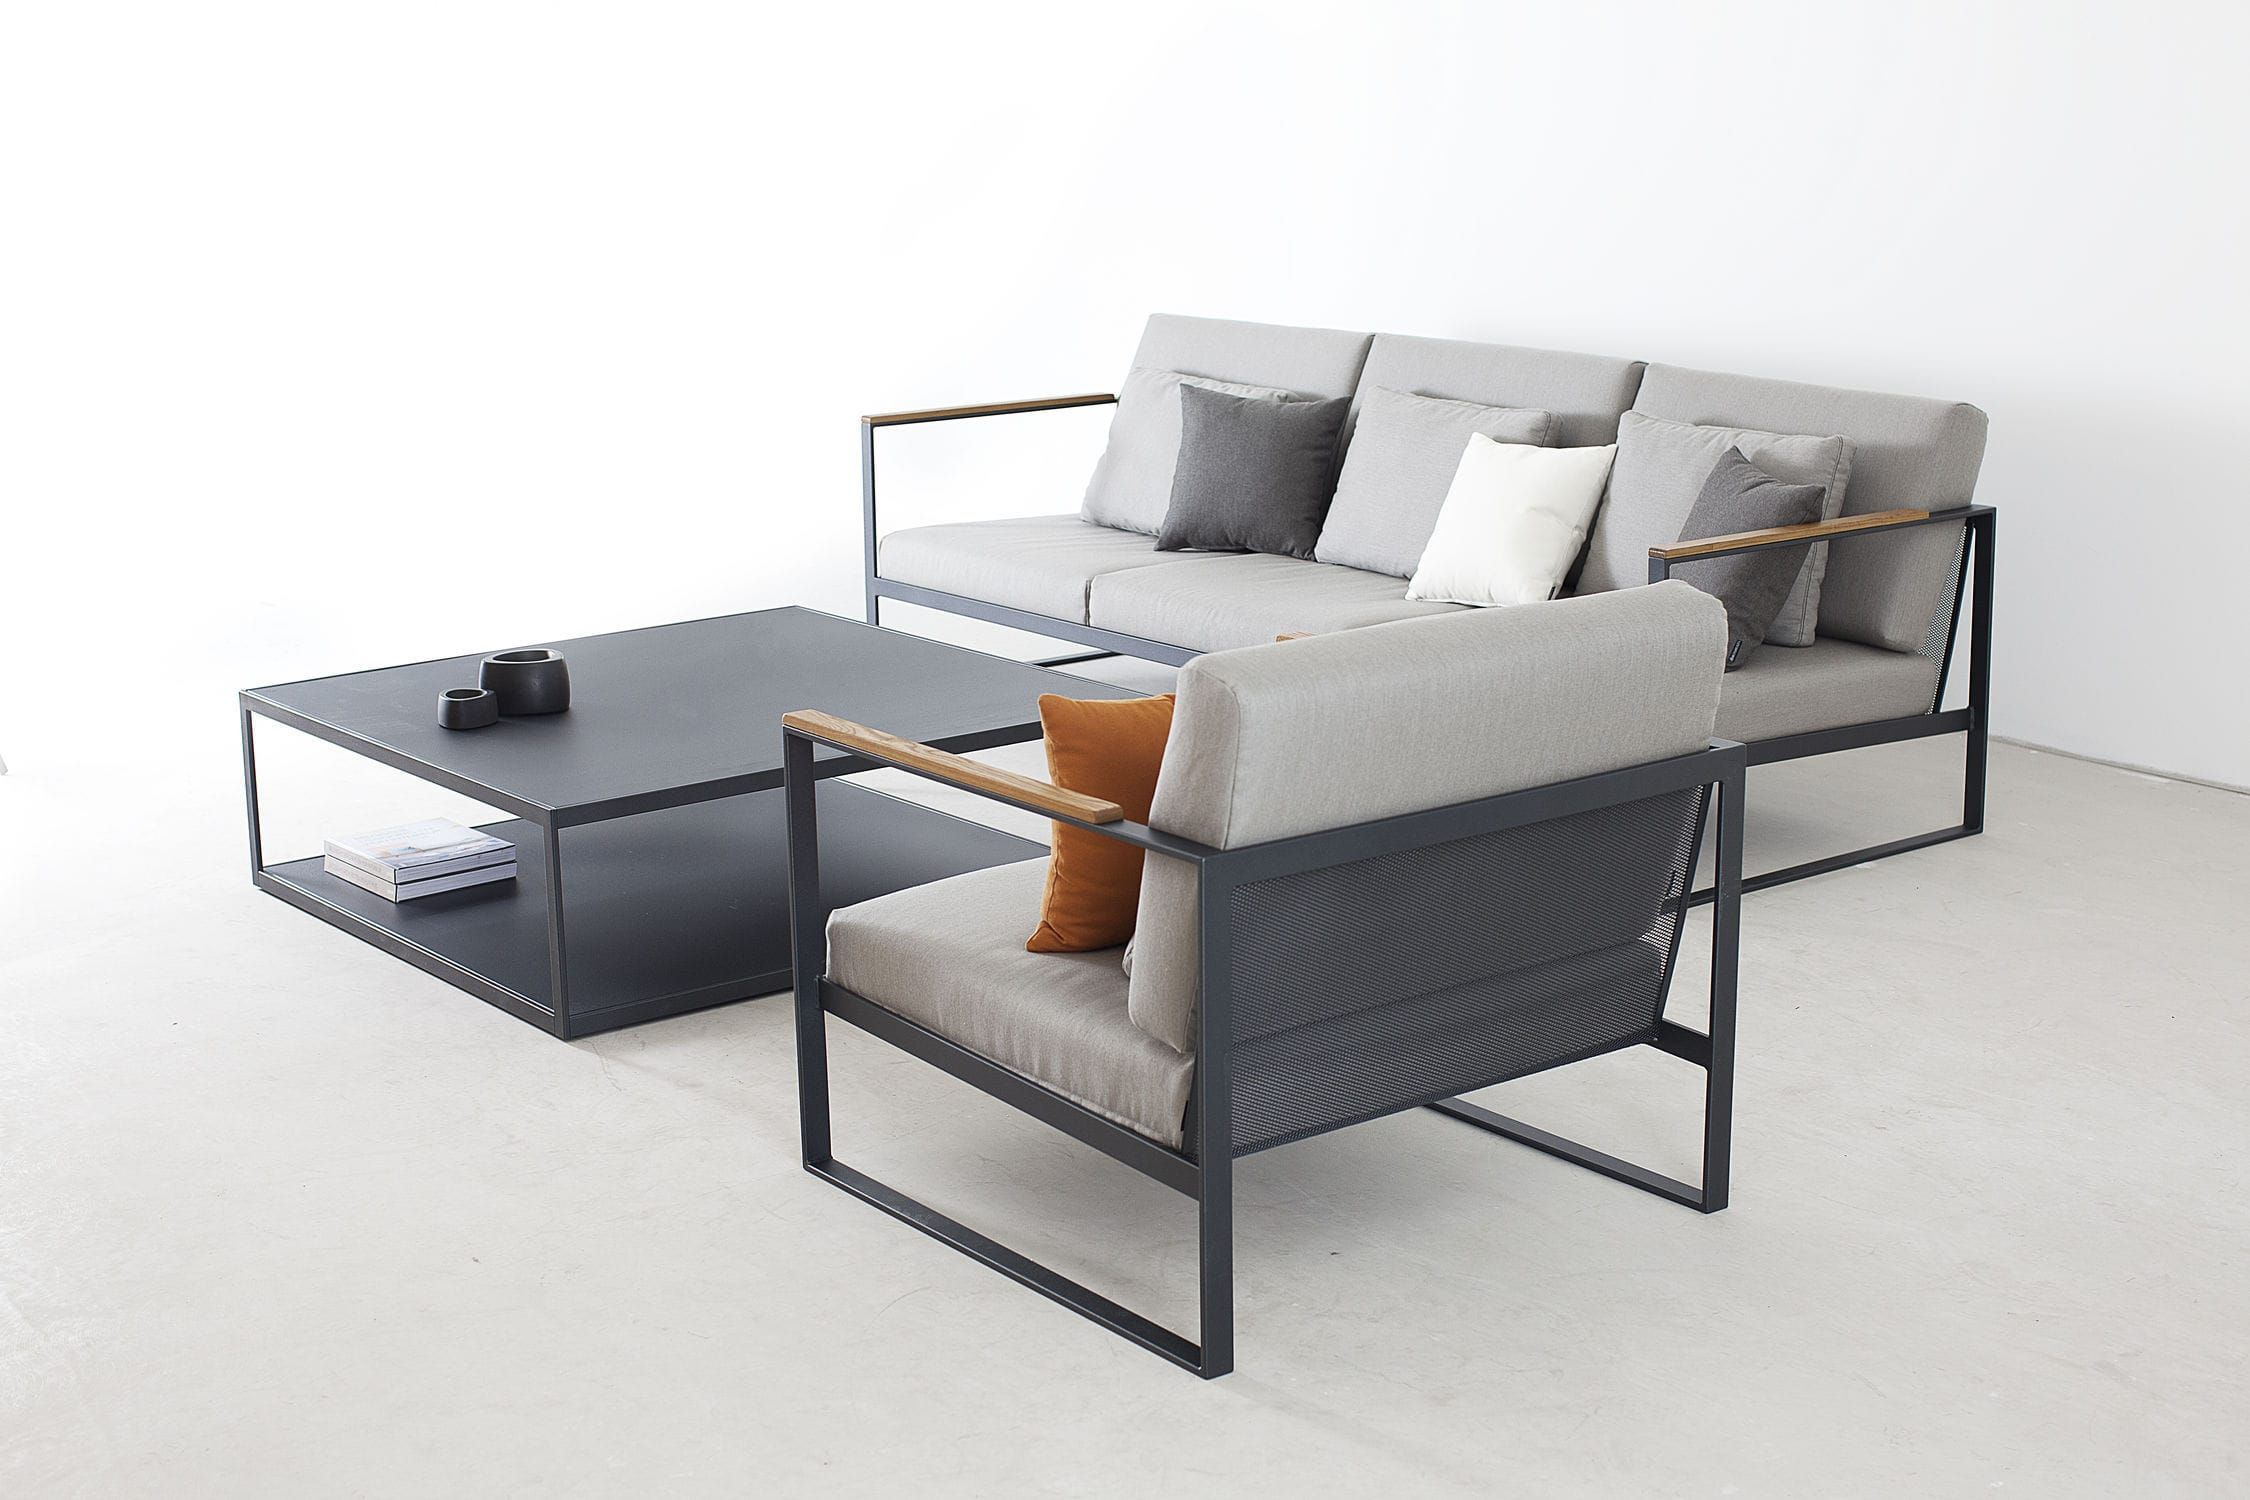 Pin de gabriel angulo en Madera | Pinterest | Muebles modernos ...